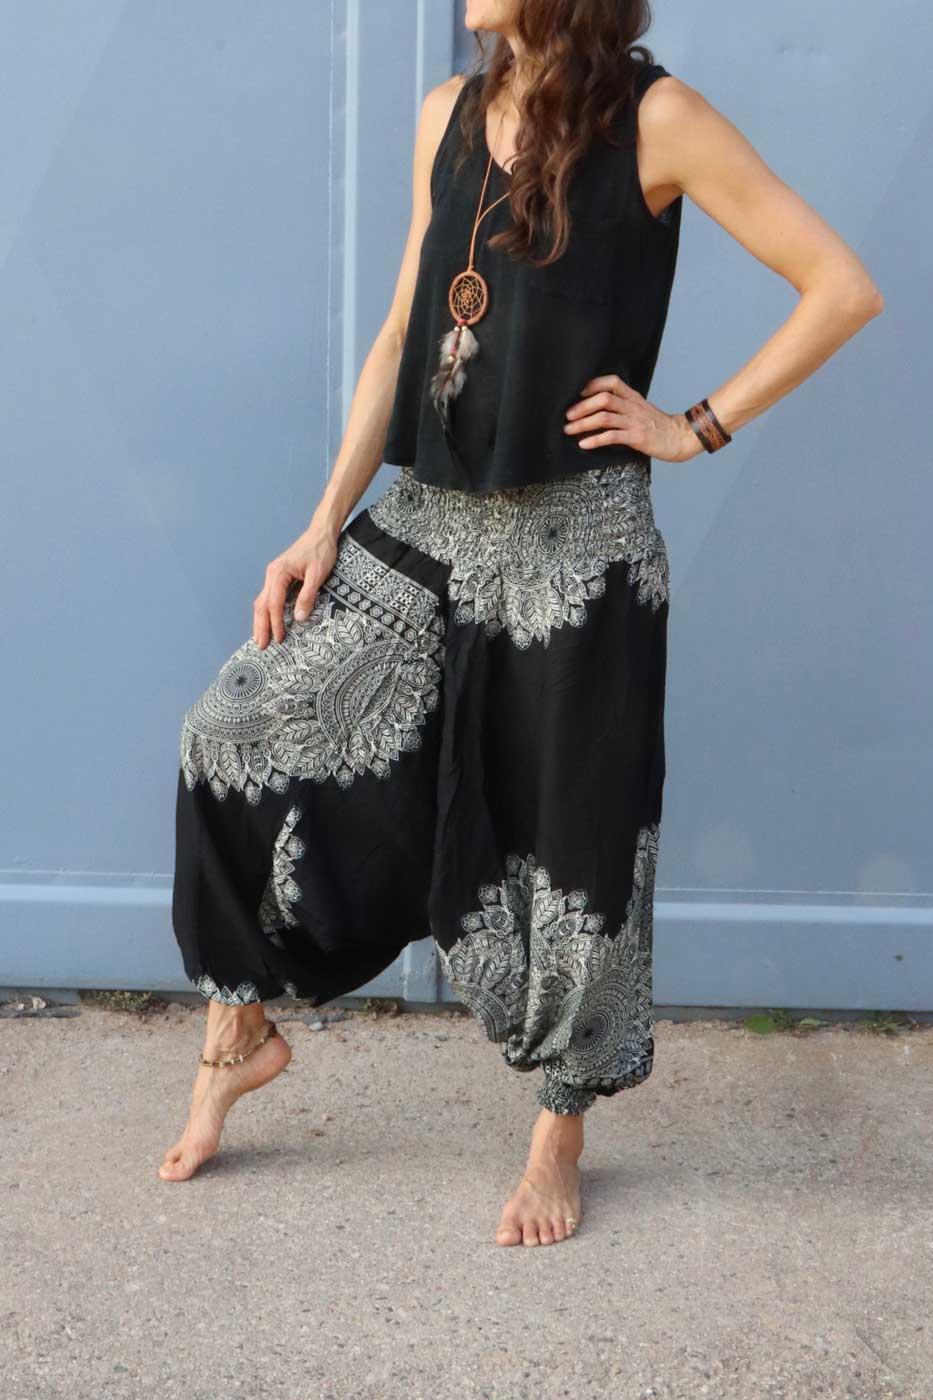 3a79cef292 Alibaba Haremshose Hosenkleid Damen Schwarz | Beige - LaCozy Onlineshop